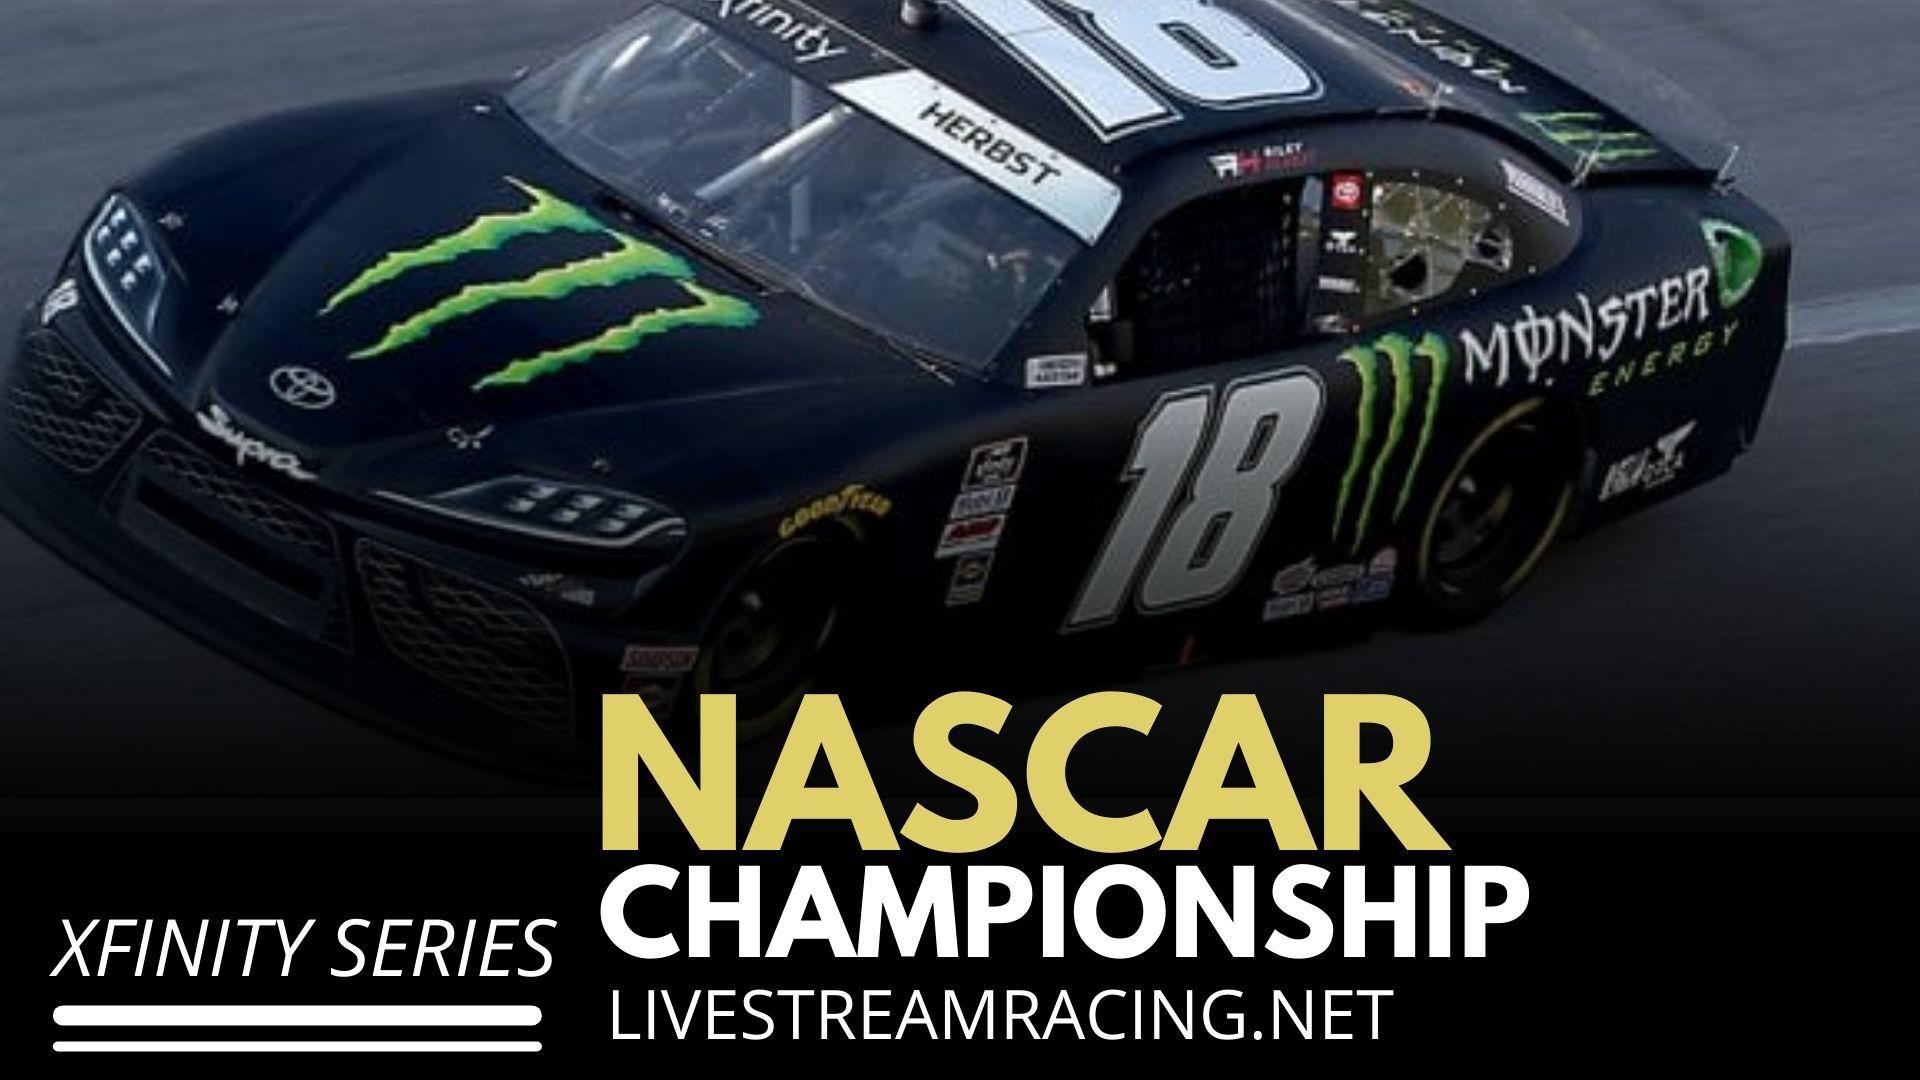 Nascar Championship Live Stream 2021 - Xfinity Series